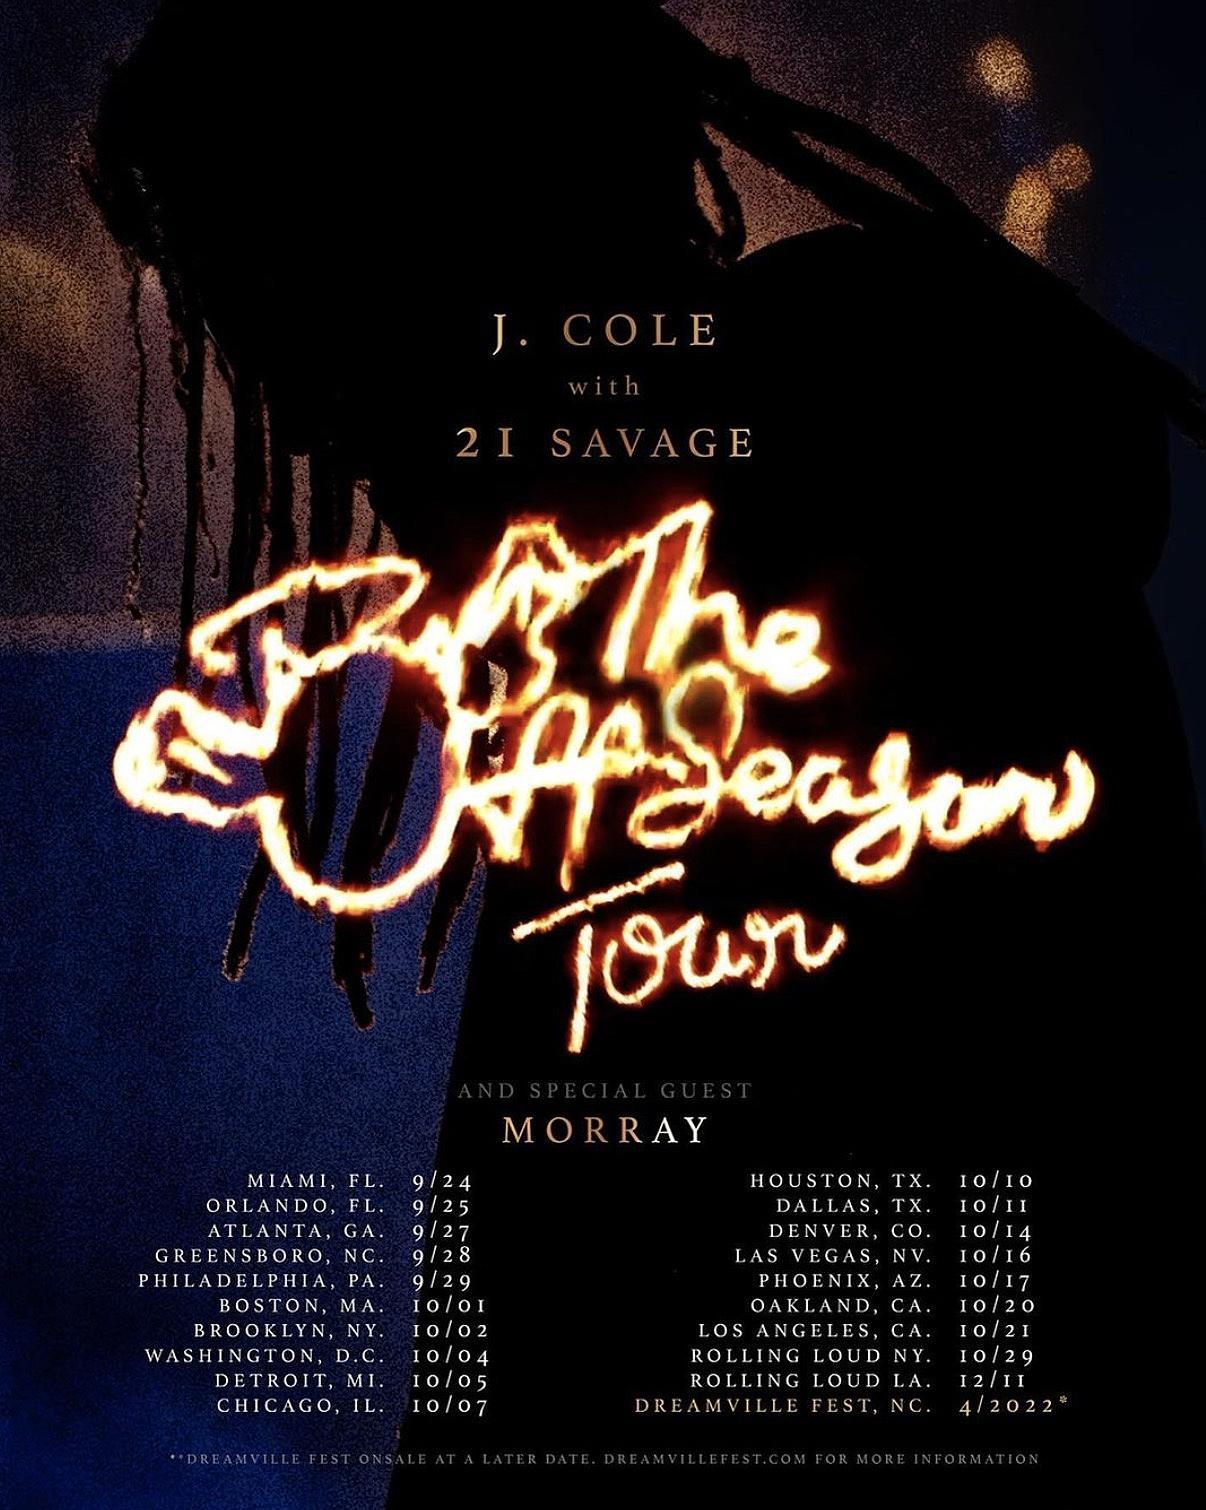 J. Cole Announces Headlining Tour With 21 Savage, Morray - XXL